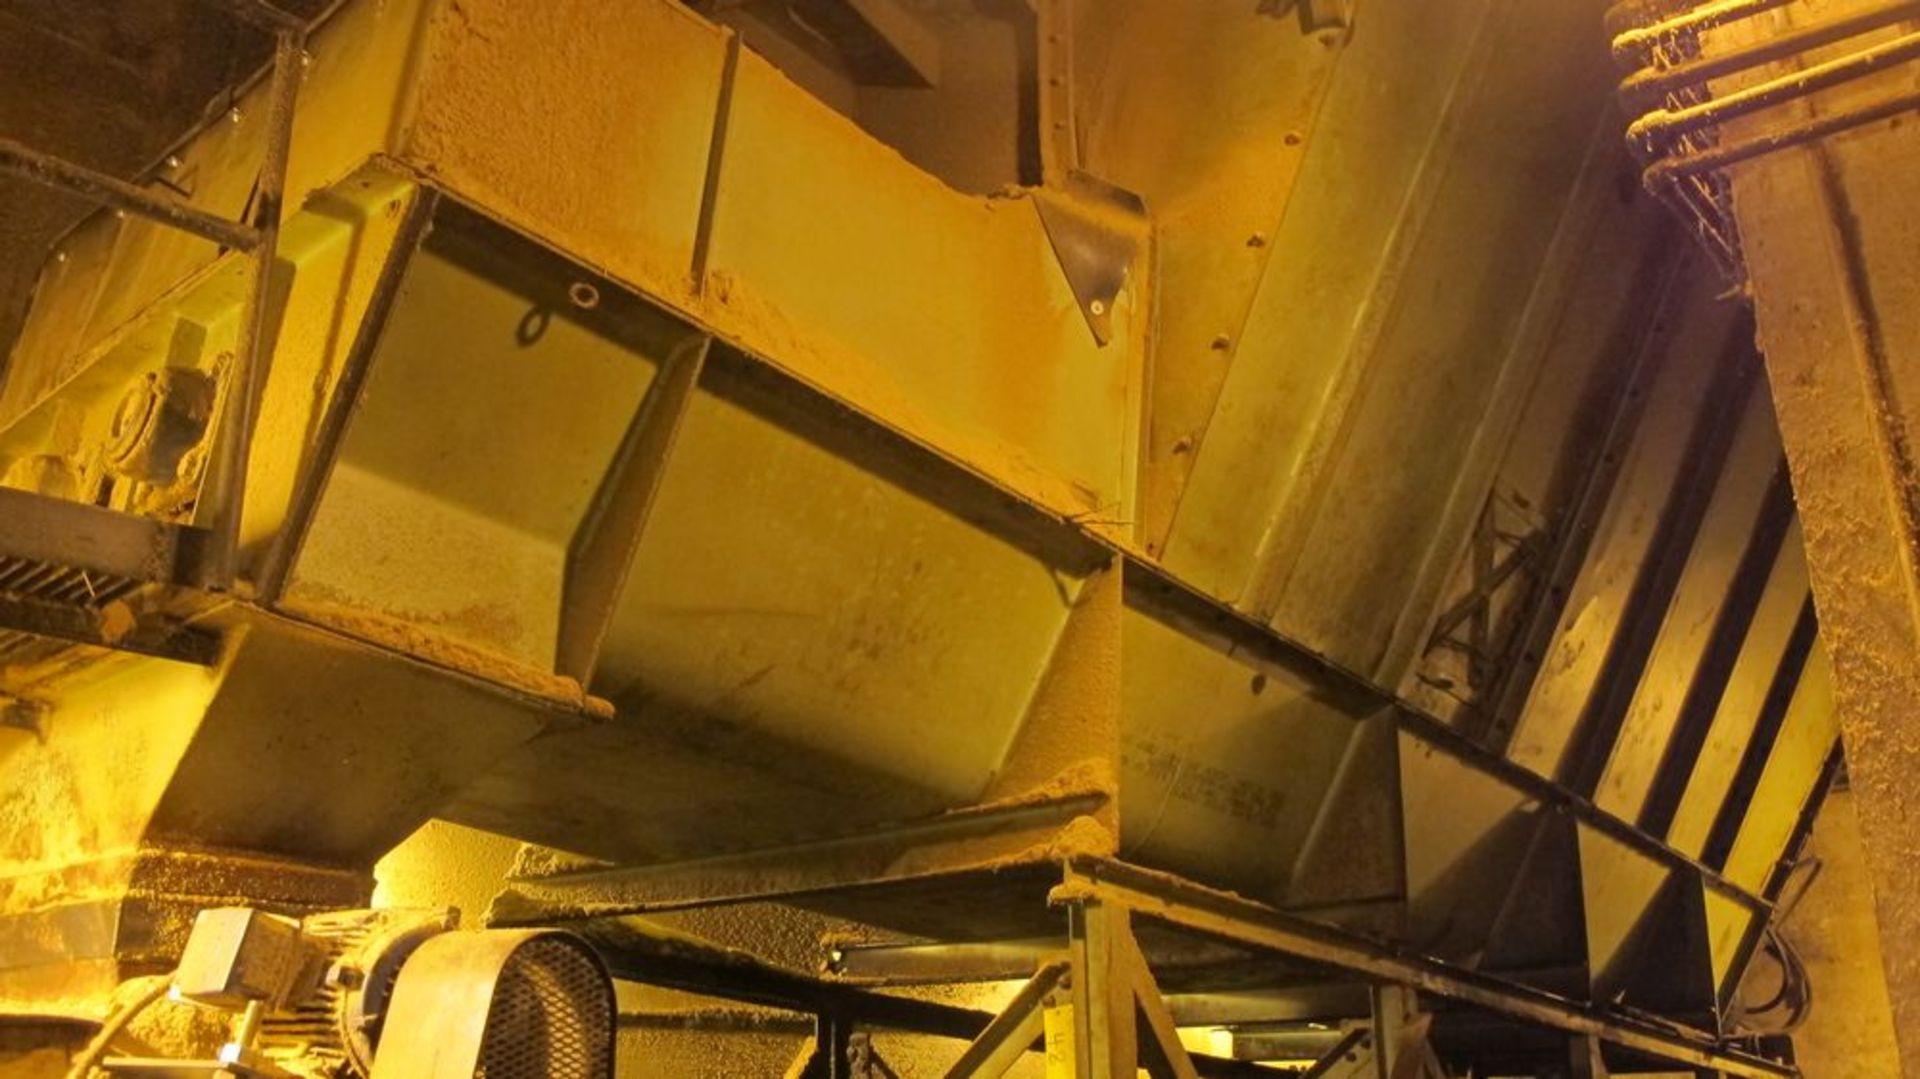 Lot 48 - DUMP HOPPER W/3 ROTARY SCREWS IN BOTTOM, 18'L X 9'W (APPROX) (UNDER TRUCK DUMPER) (WOOD YARD)